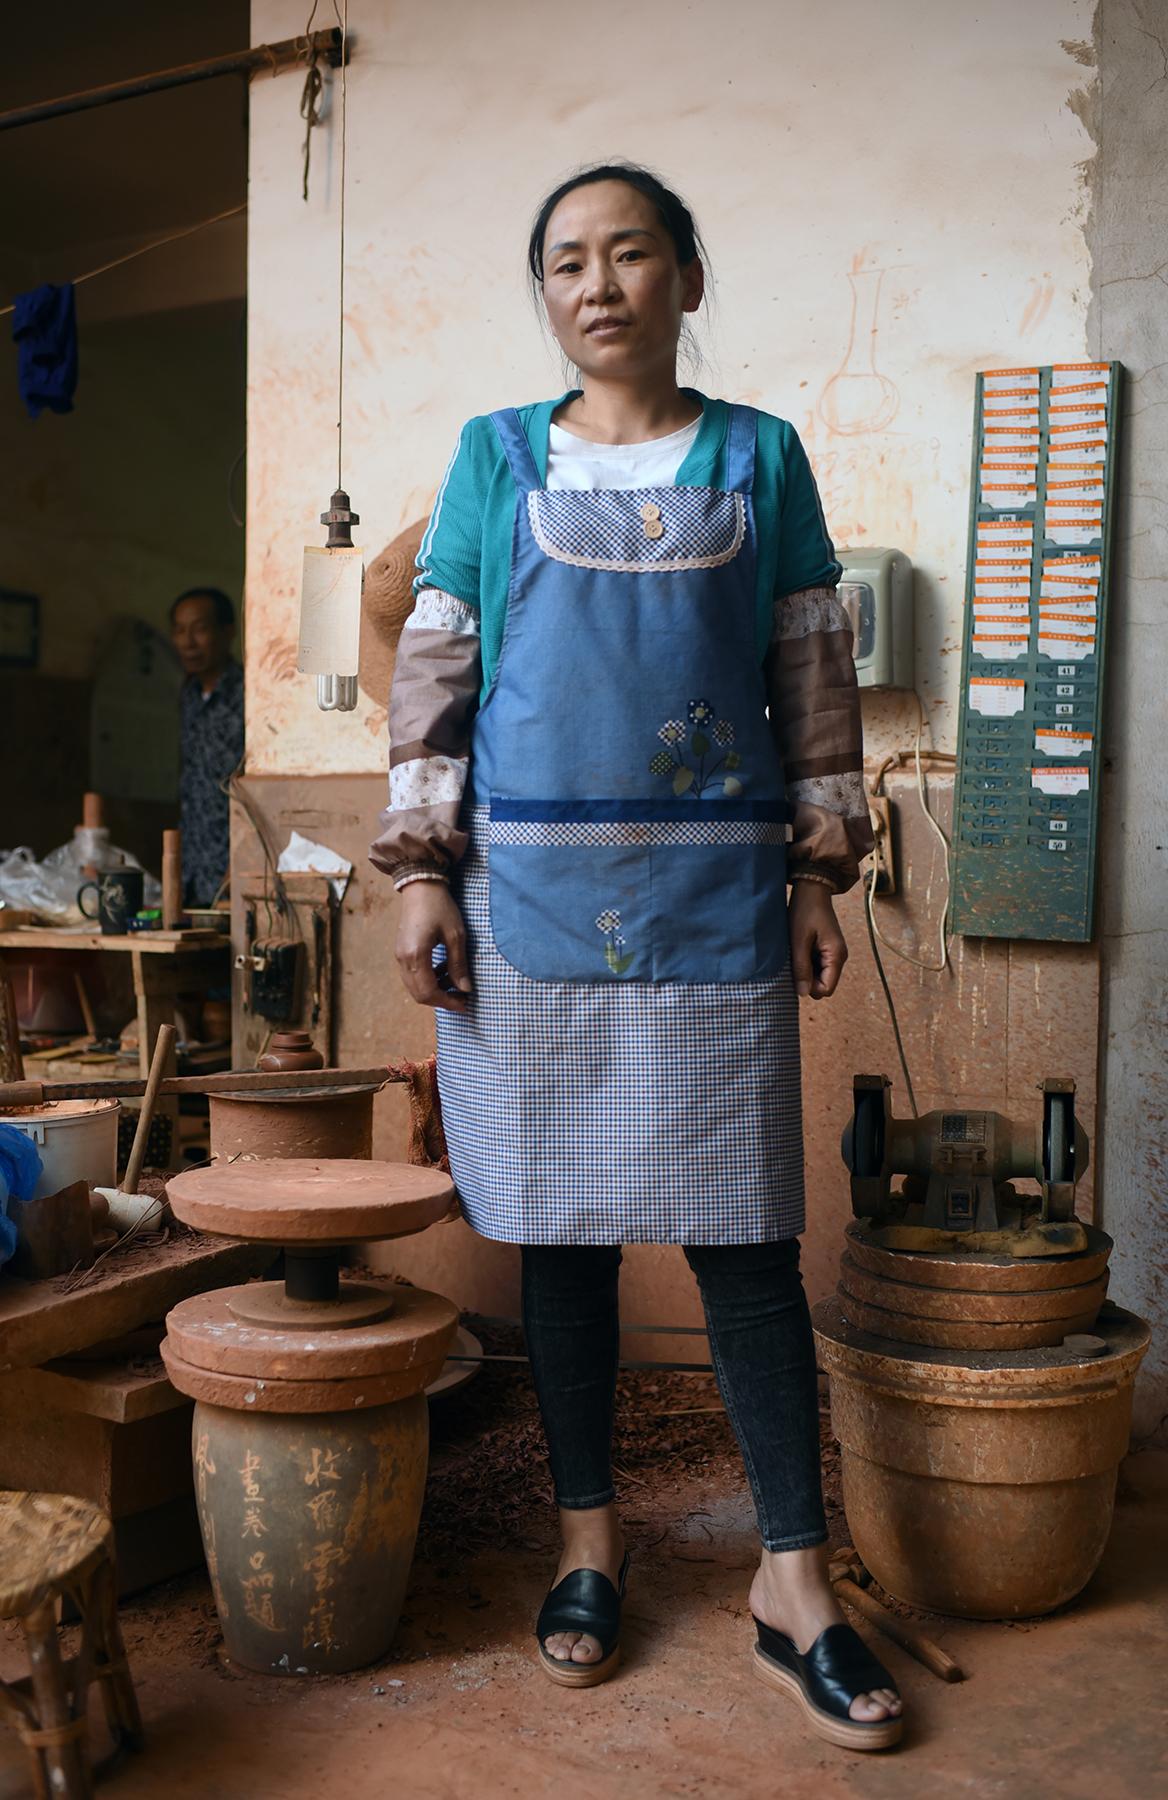 Purple pottery apprentice, Jianshui 2017